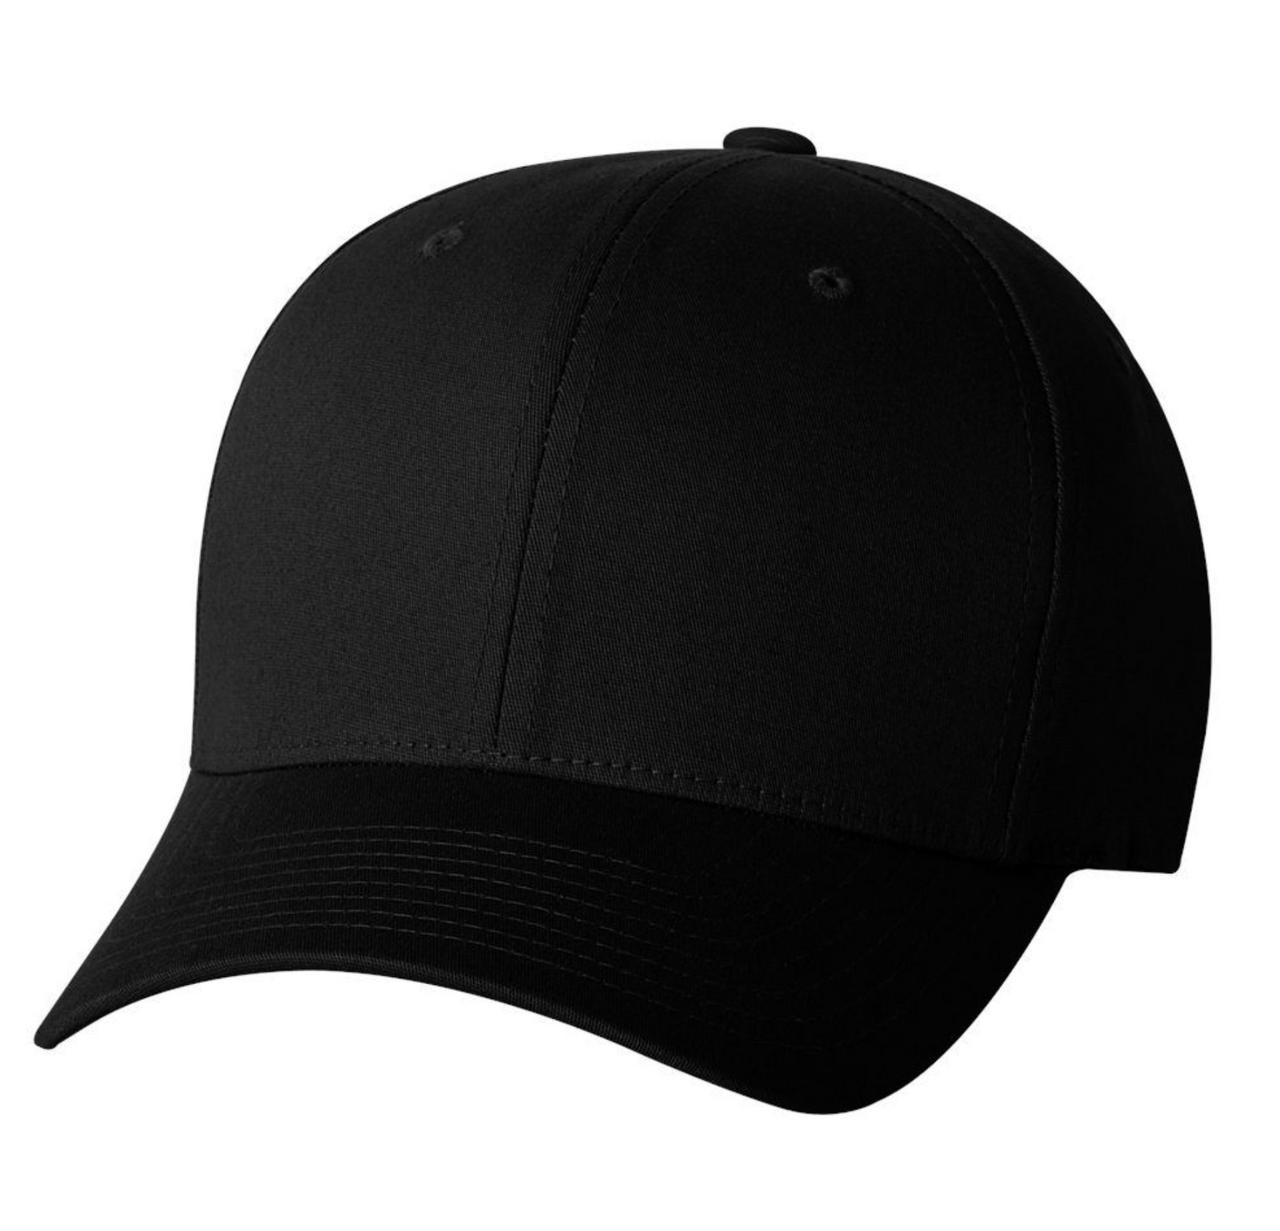 XPerformance Caps